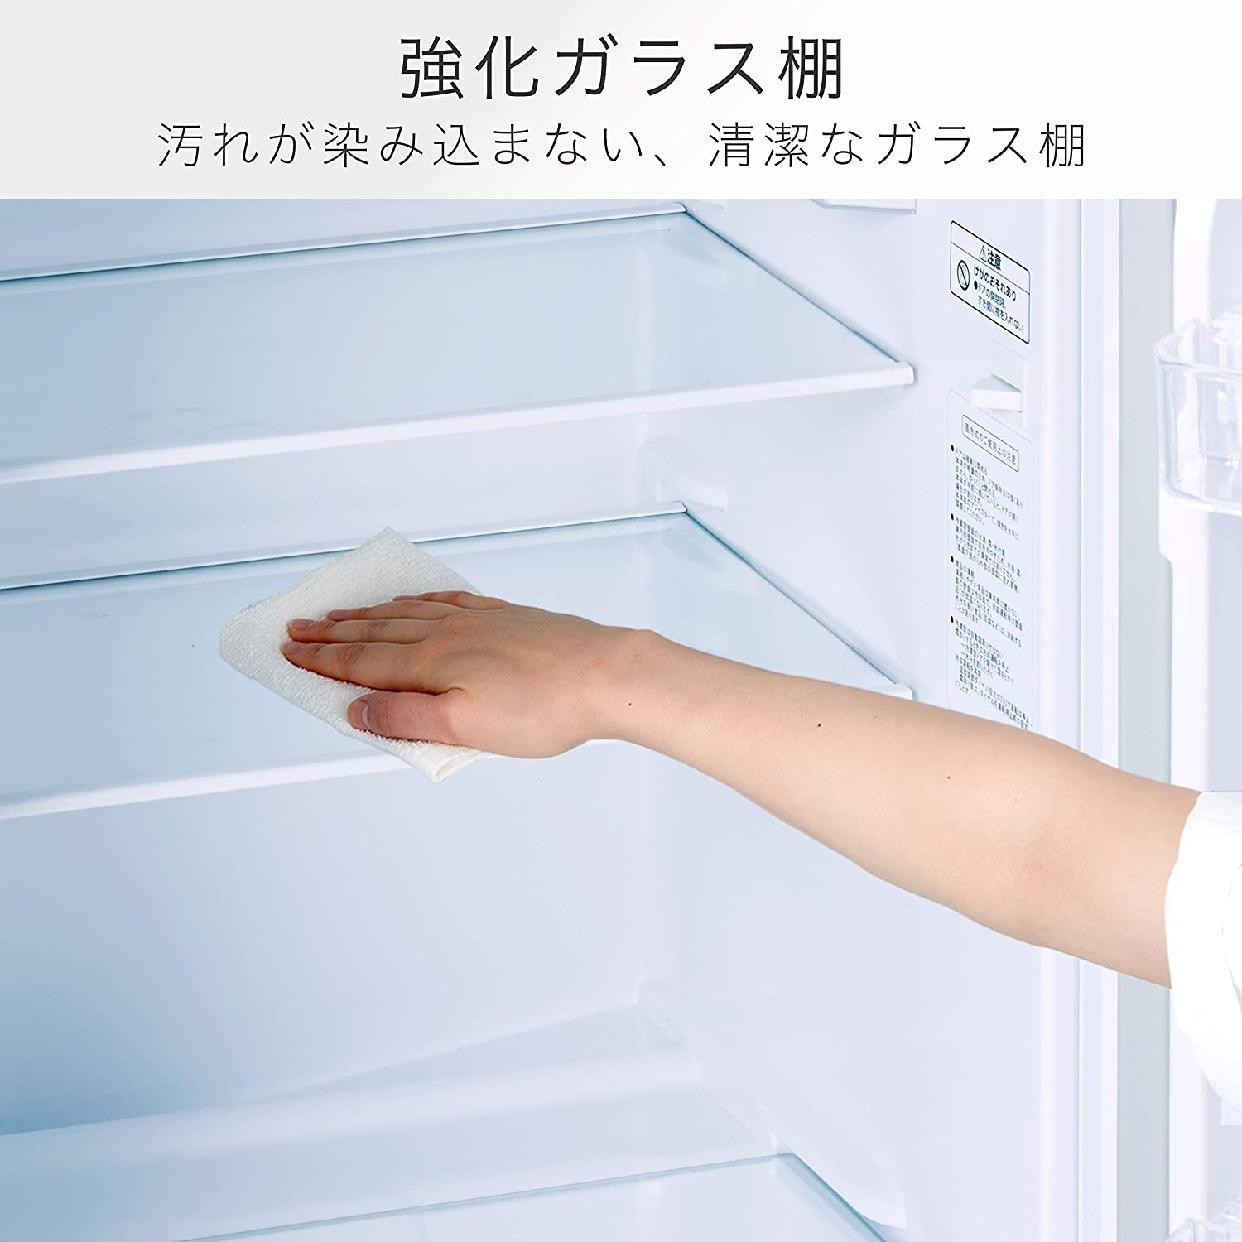 Hisense(ハイセンス)150L 冷凍冷蔵庫 HR-D15Cの商品画像7